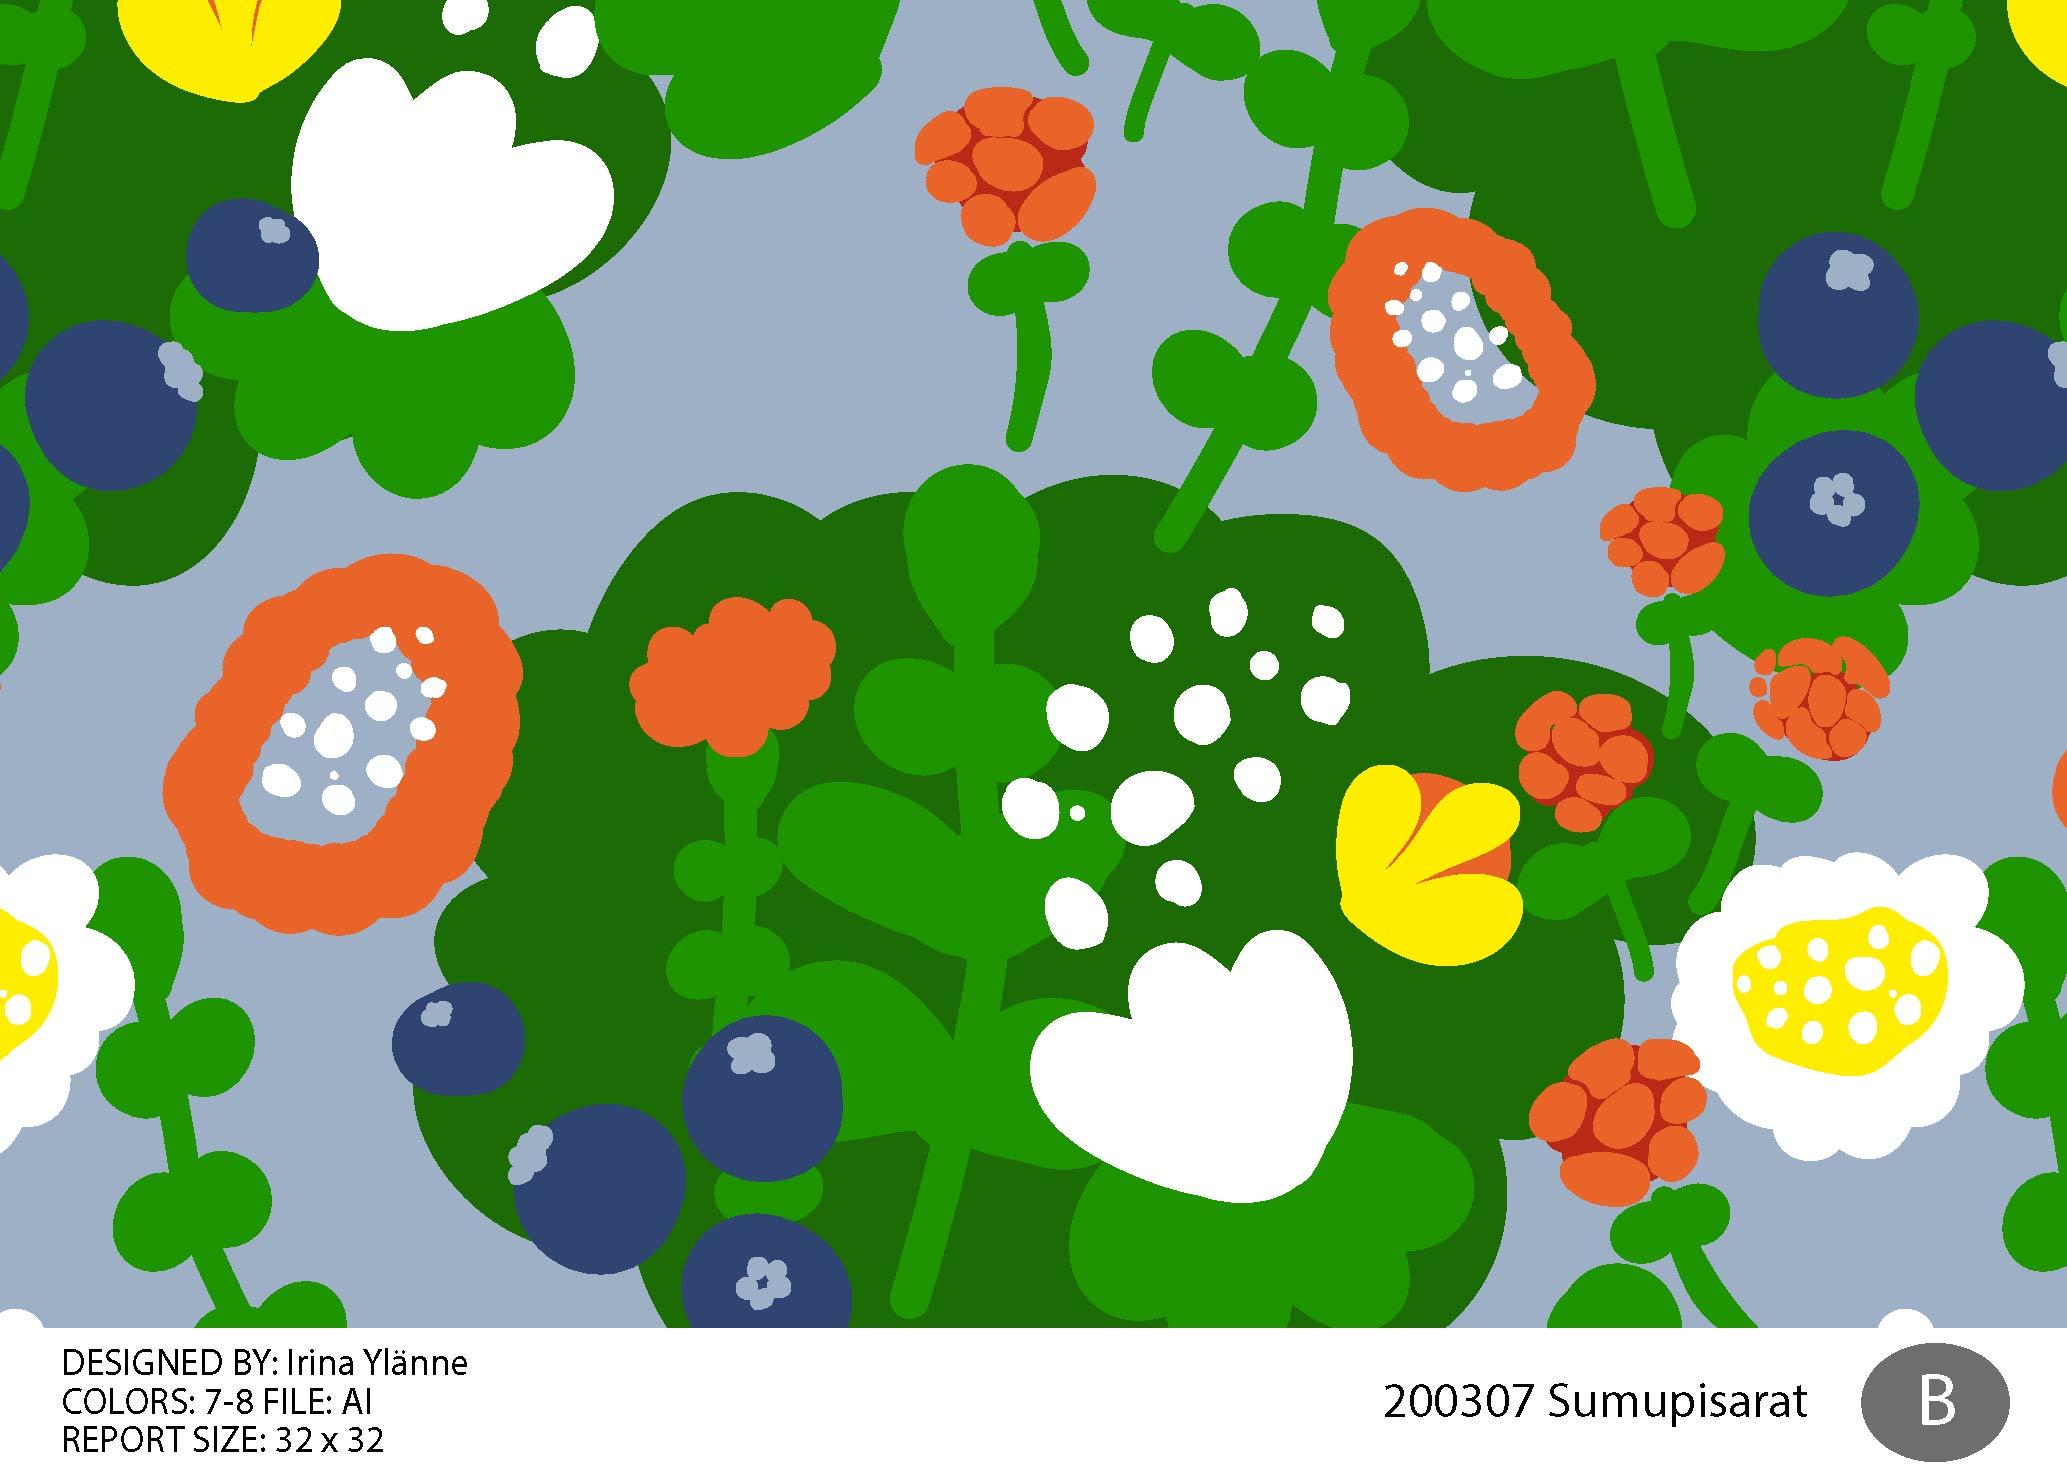 irina_Sumupisarat_200307-01